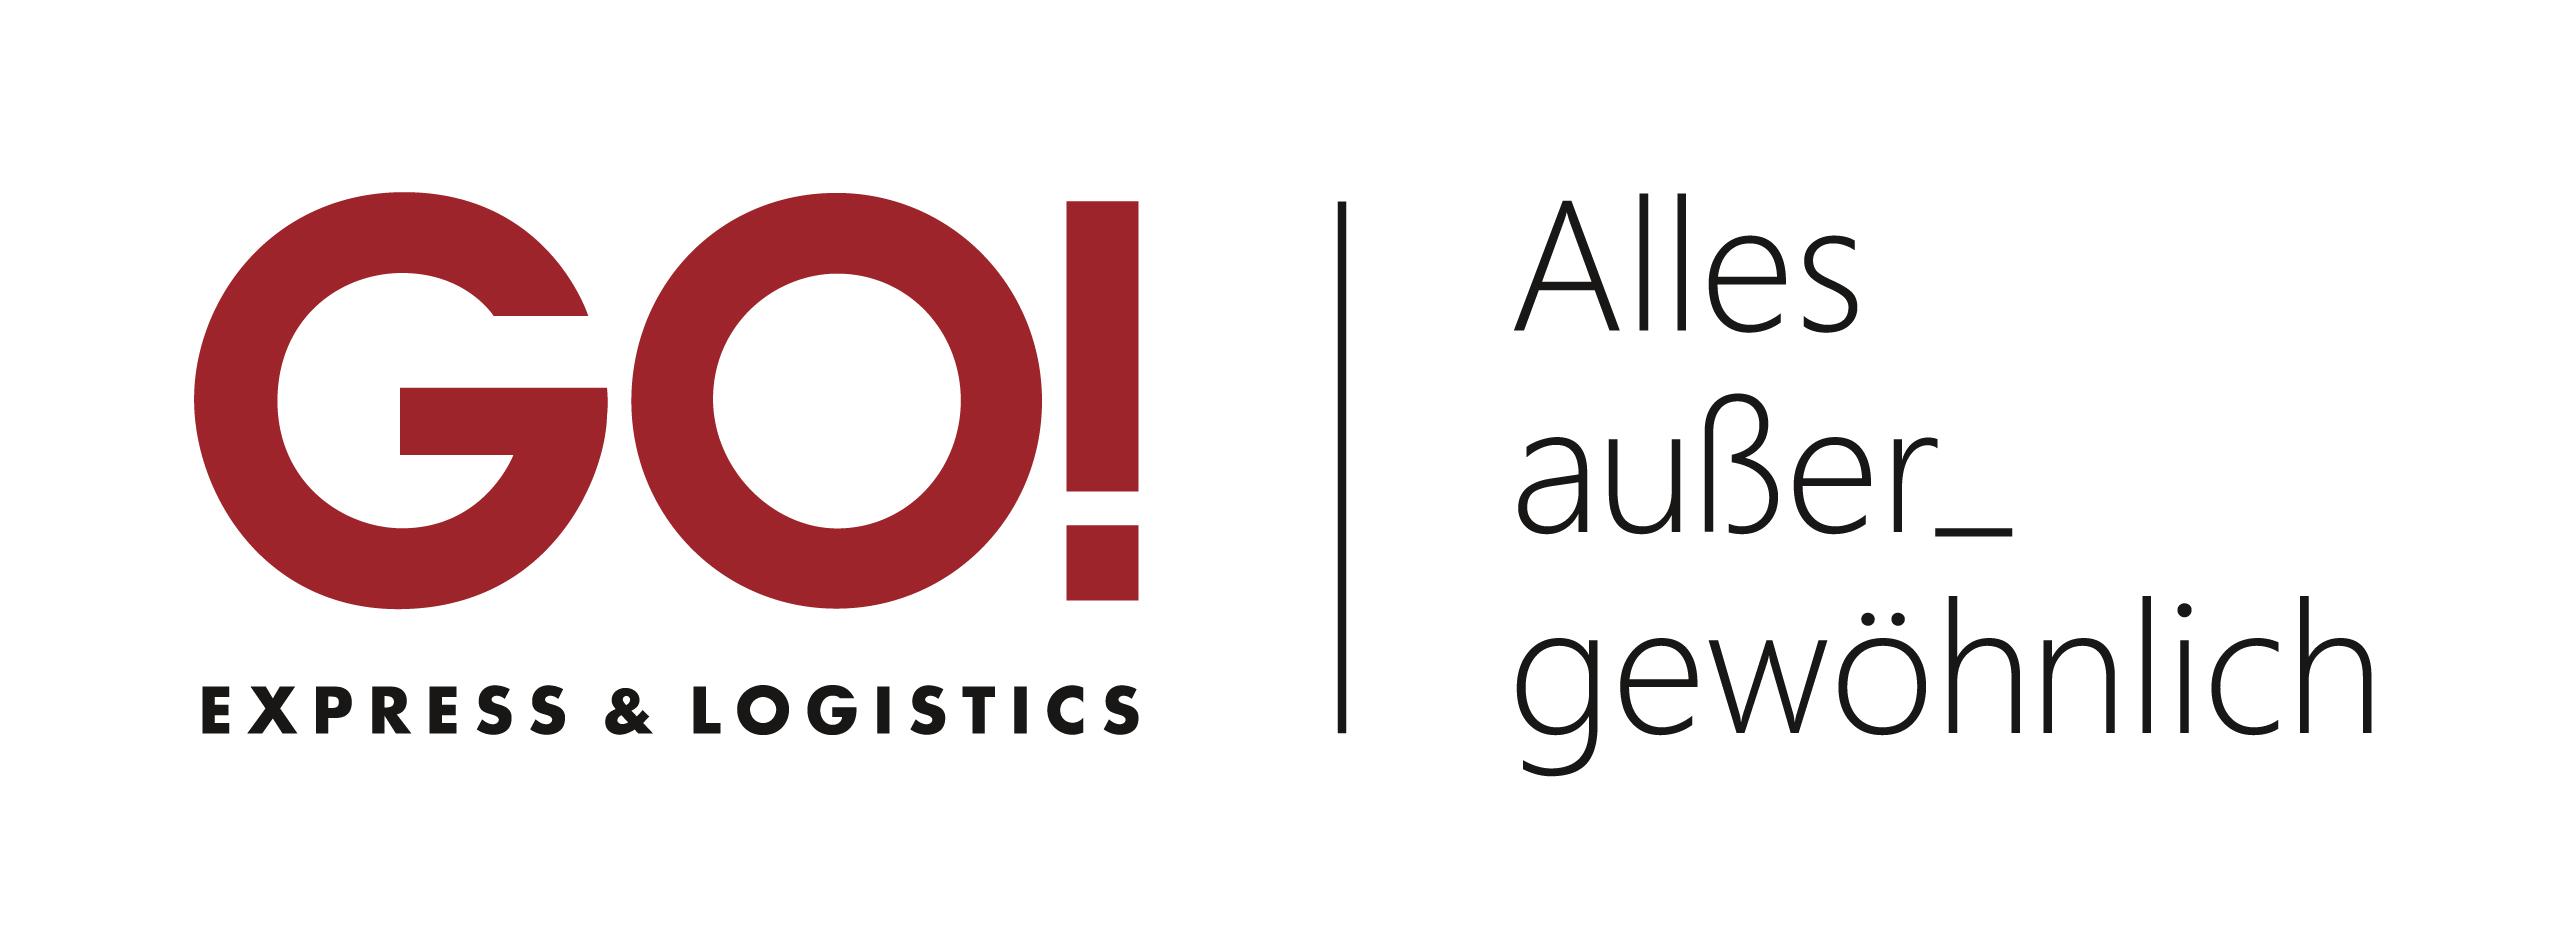 GO! Express & Logistics München GmbH